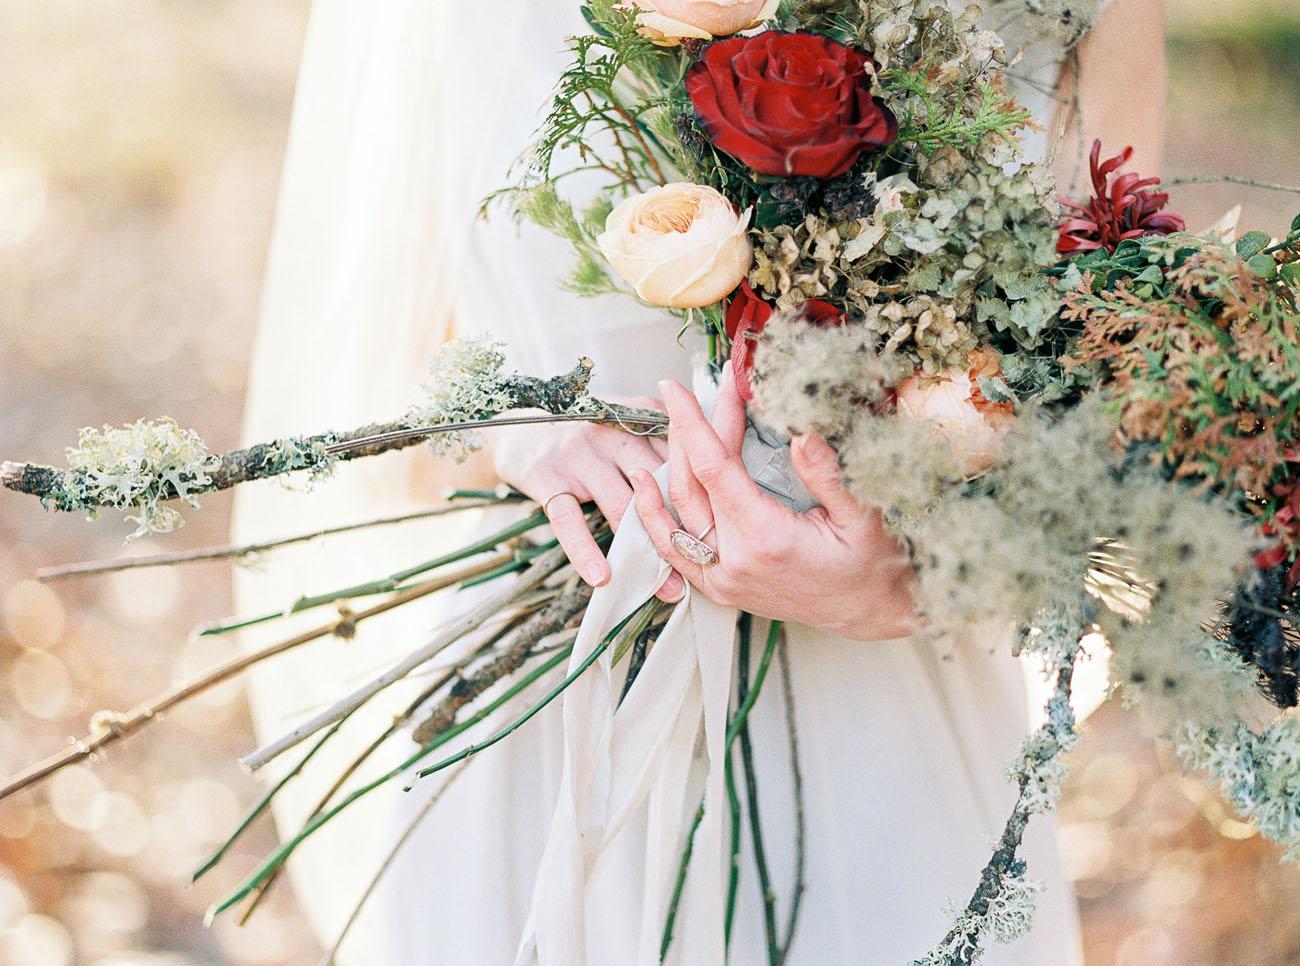 mossy bouquet